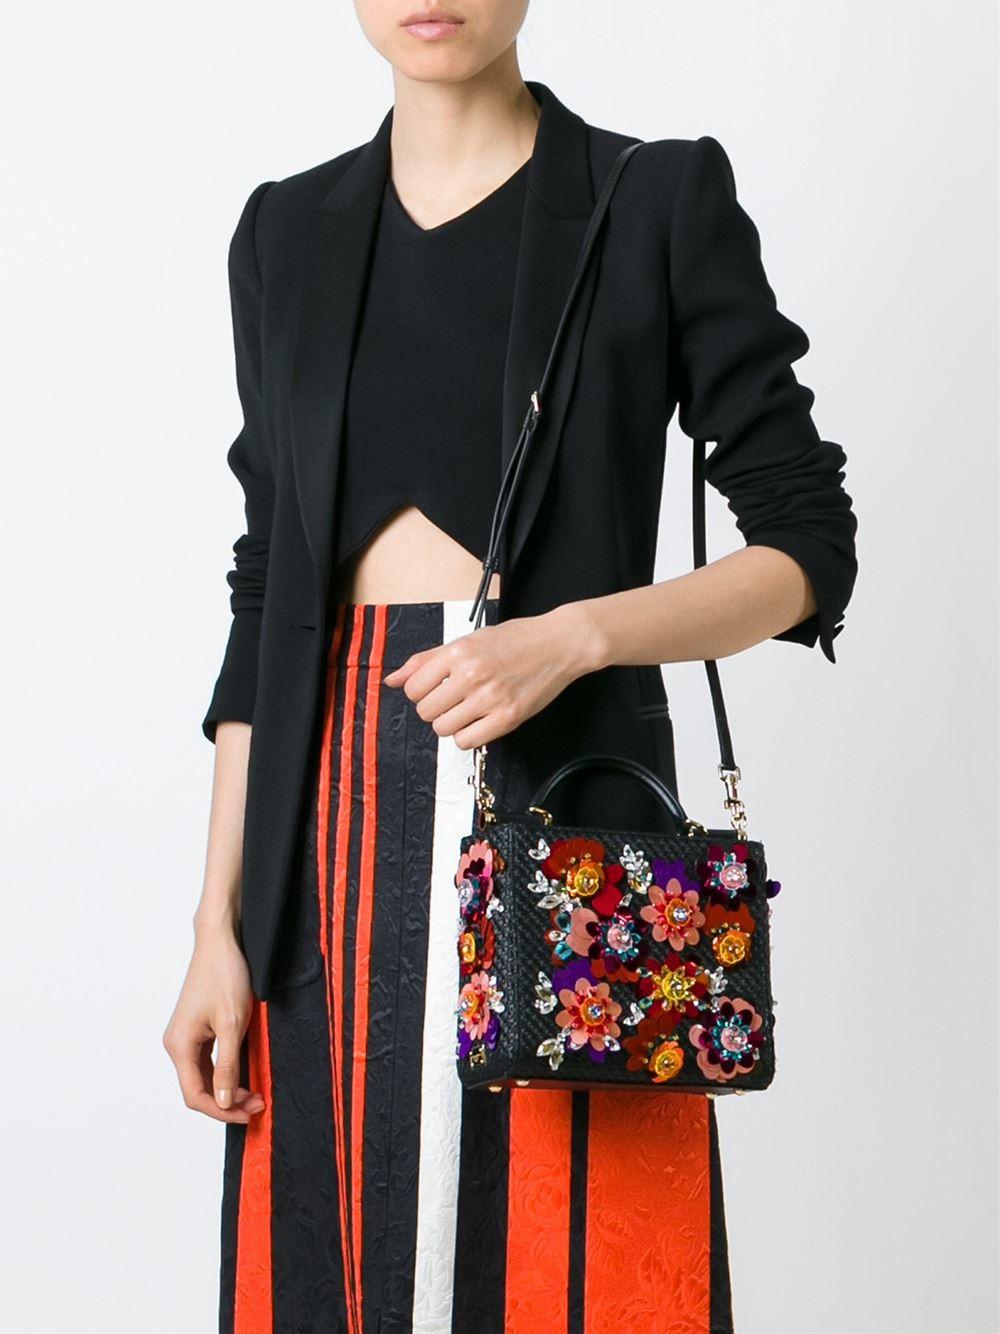 Dolce & Gabbana Black and multicolored raffia and leather 'Sicily' shopping tote $3,495